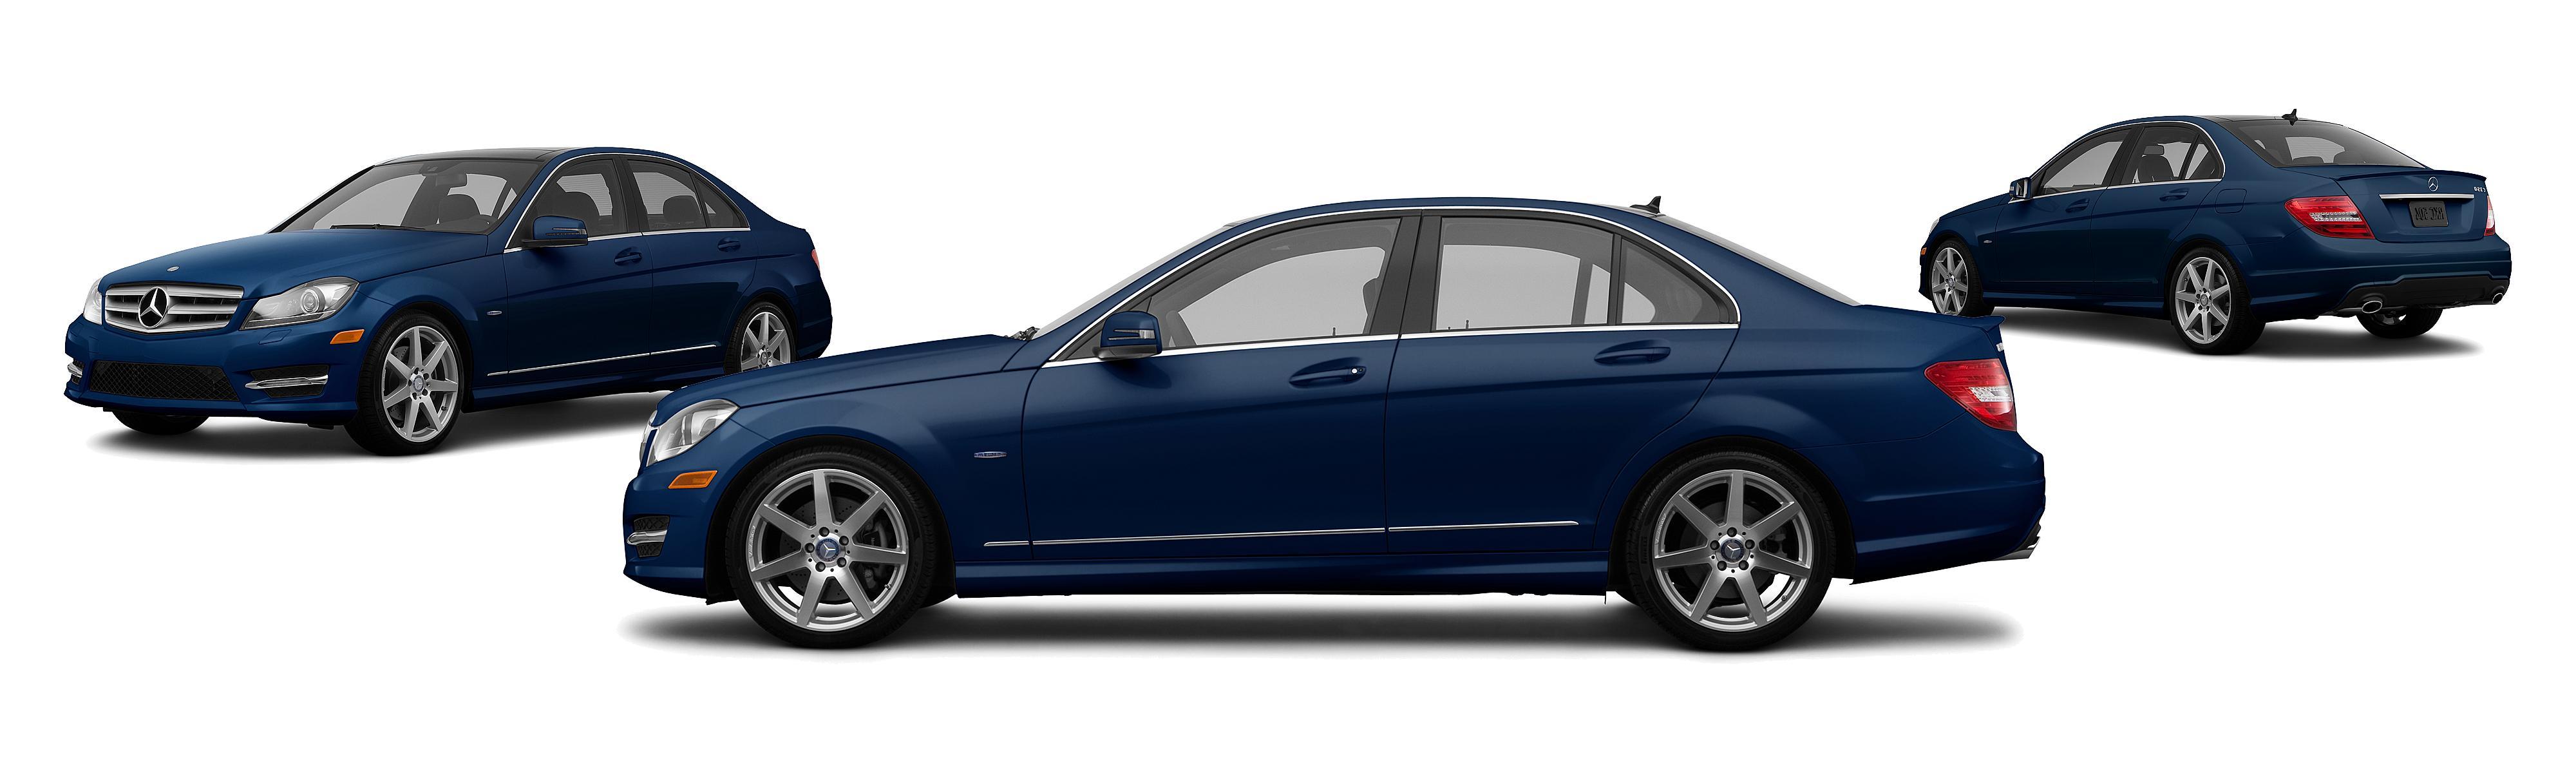 2012 Mercedes Benz C Class C 63 AMG 4dr Sedan Research GrooveCar